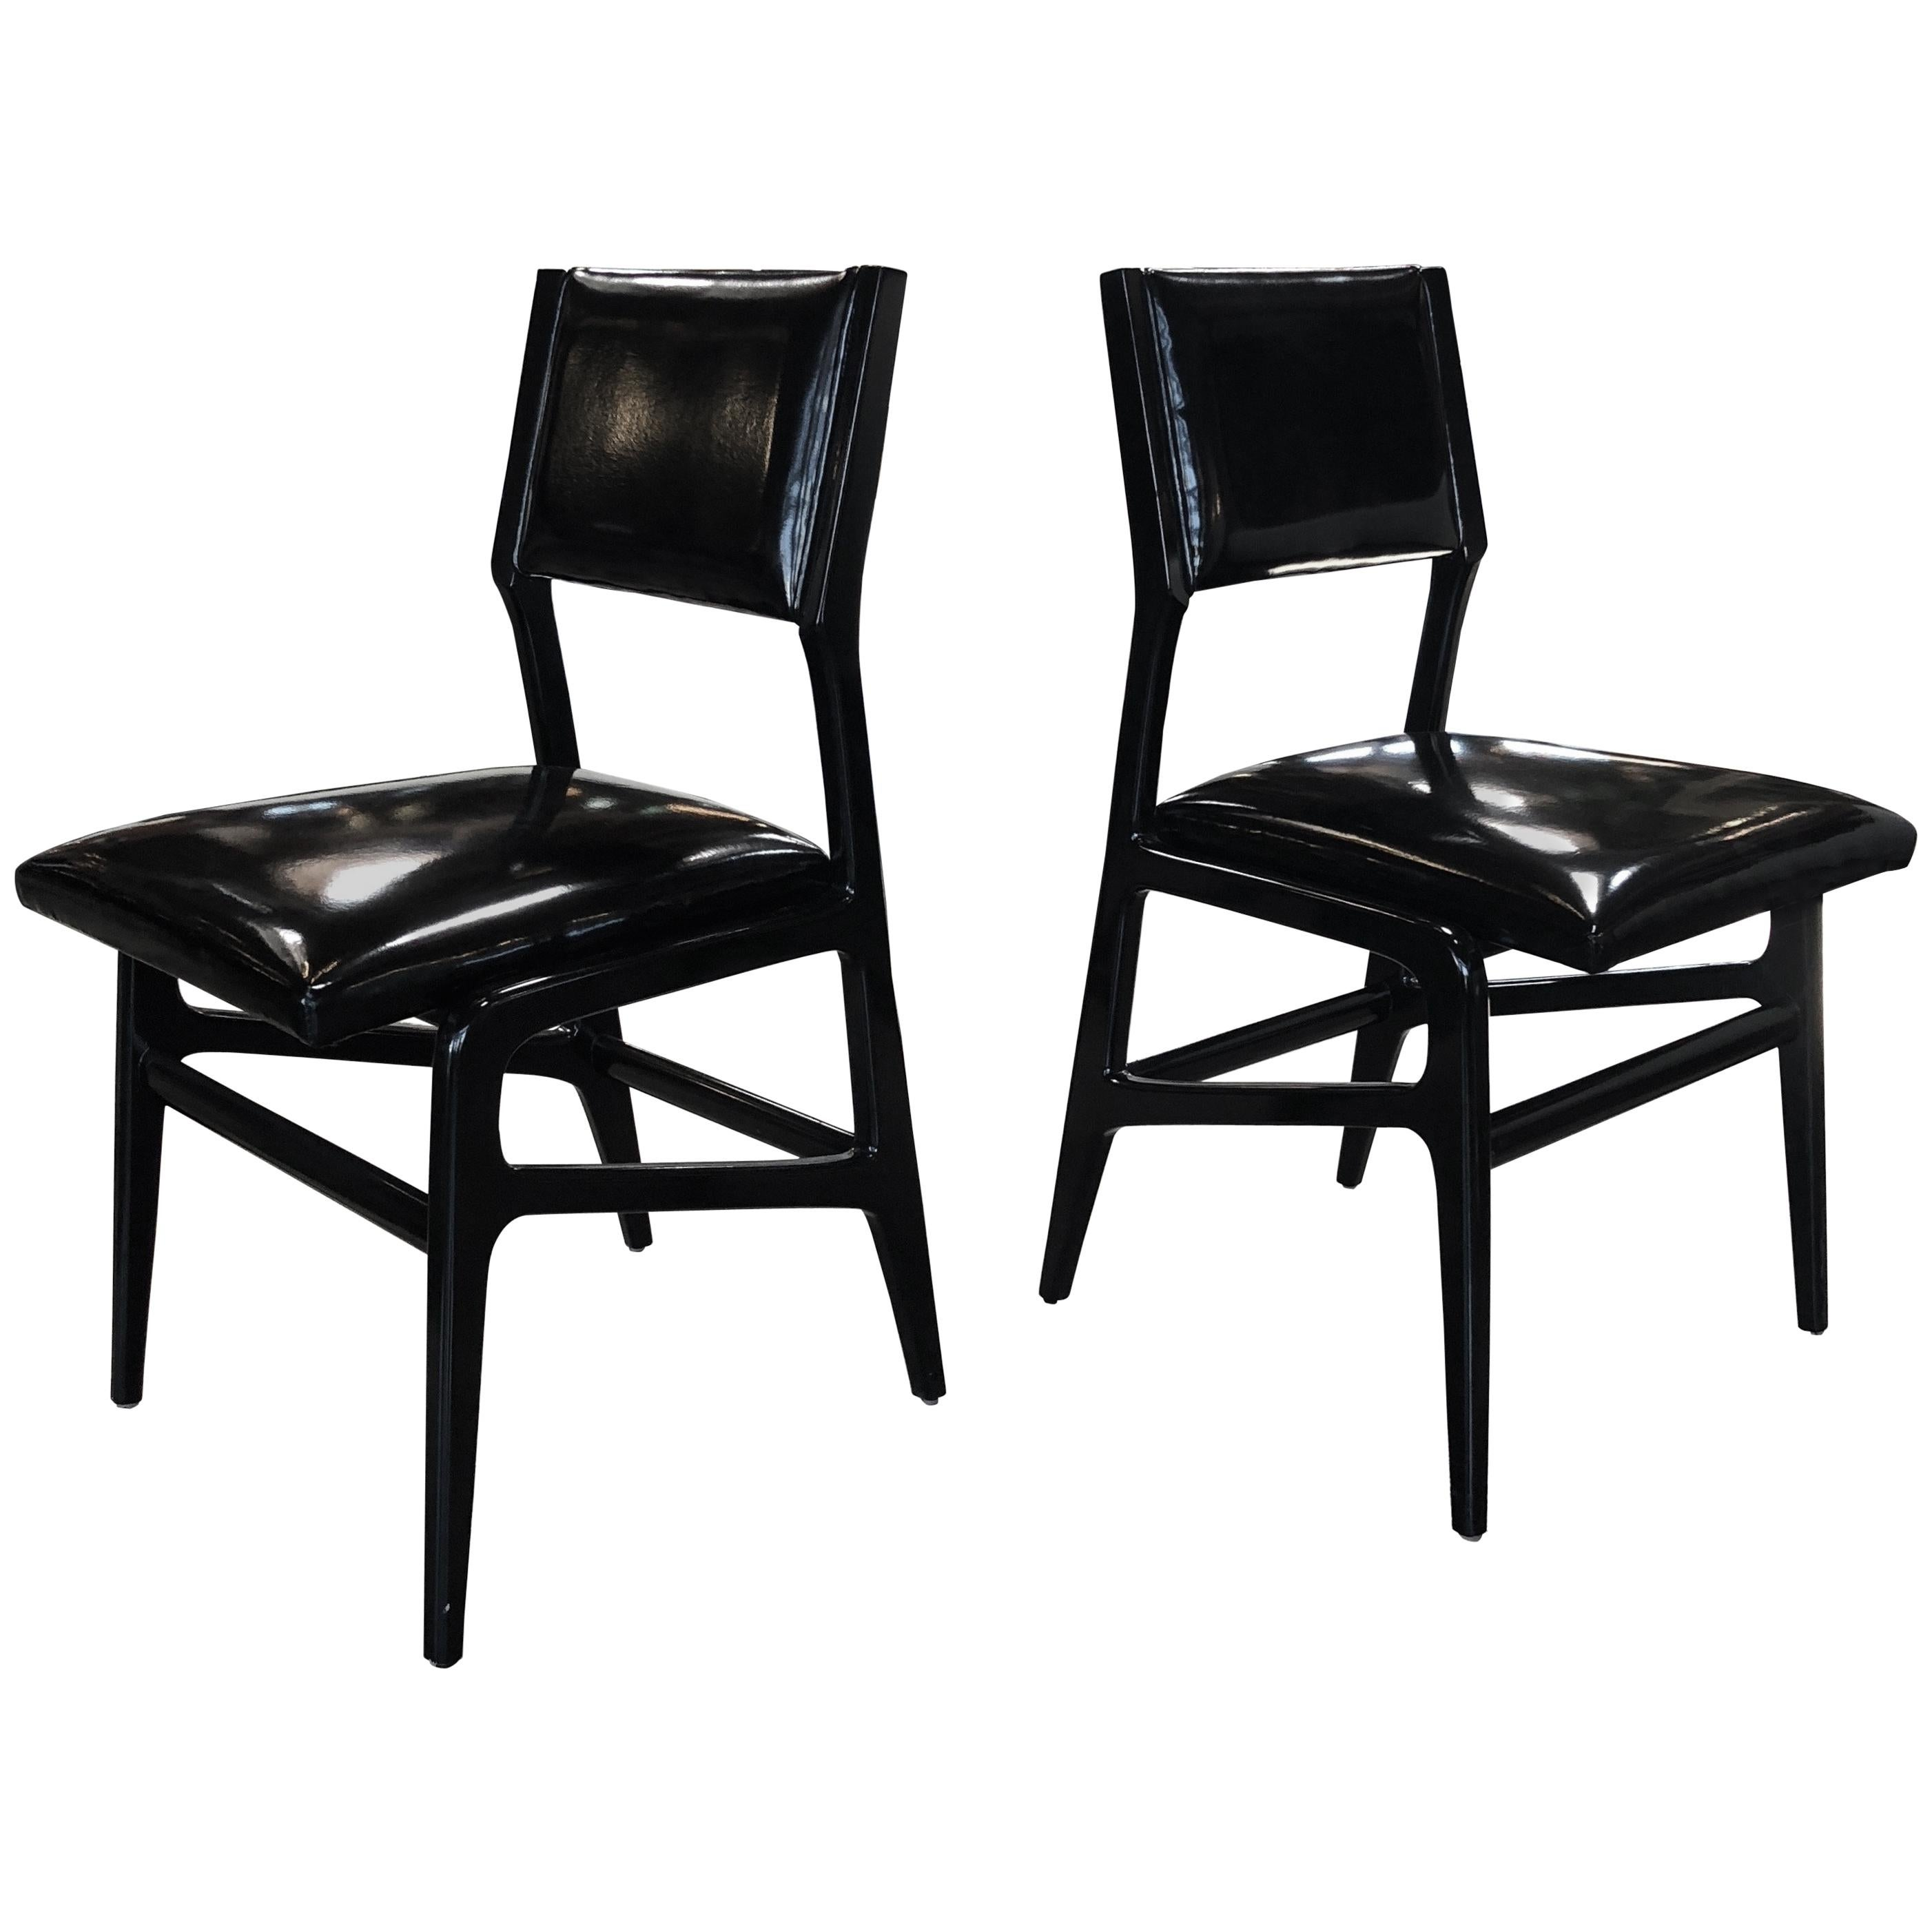 Pair of Iconic Gio Ponti Chairs, Italy 1958,